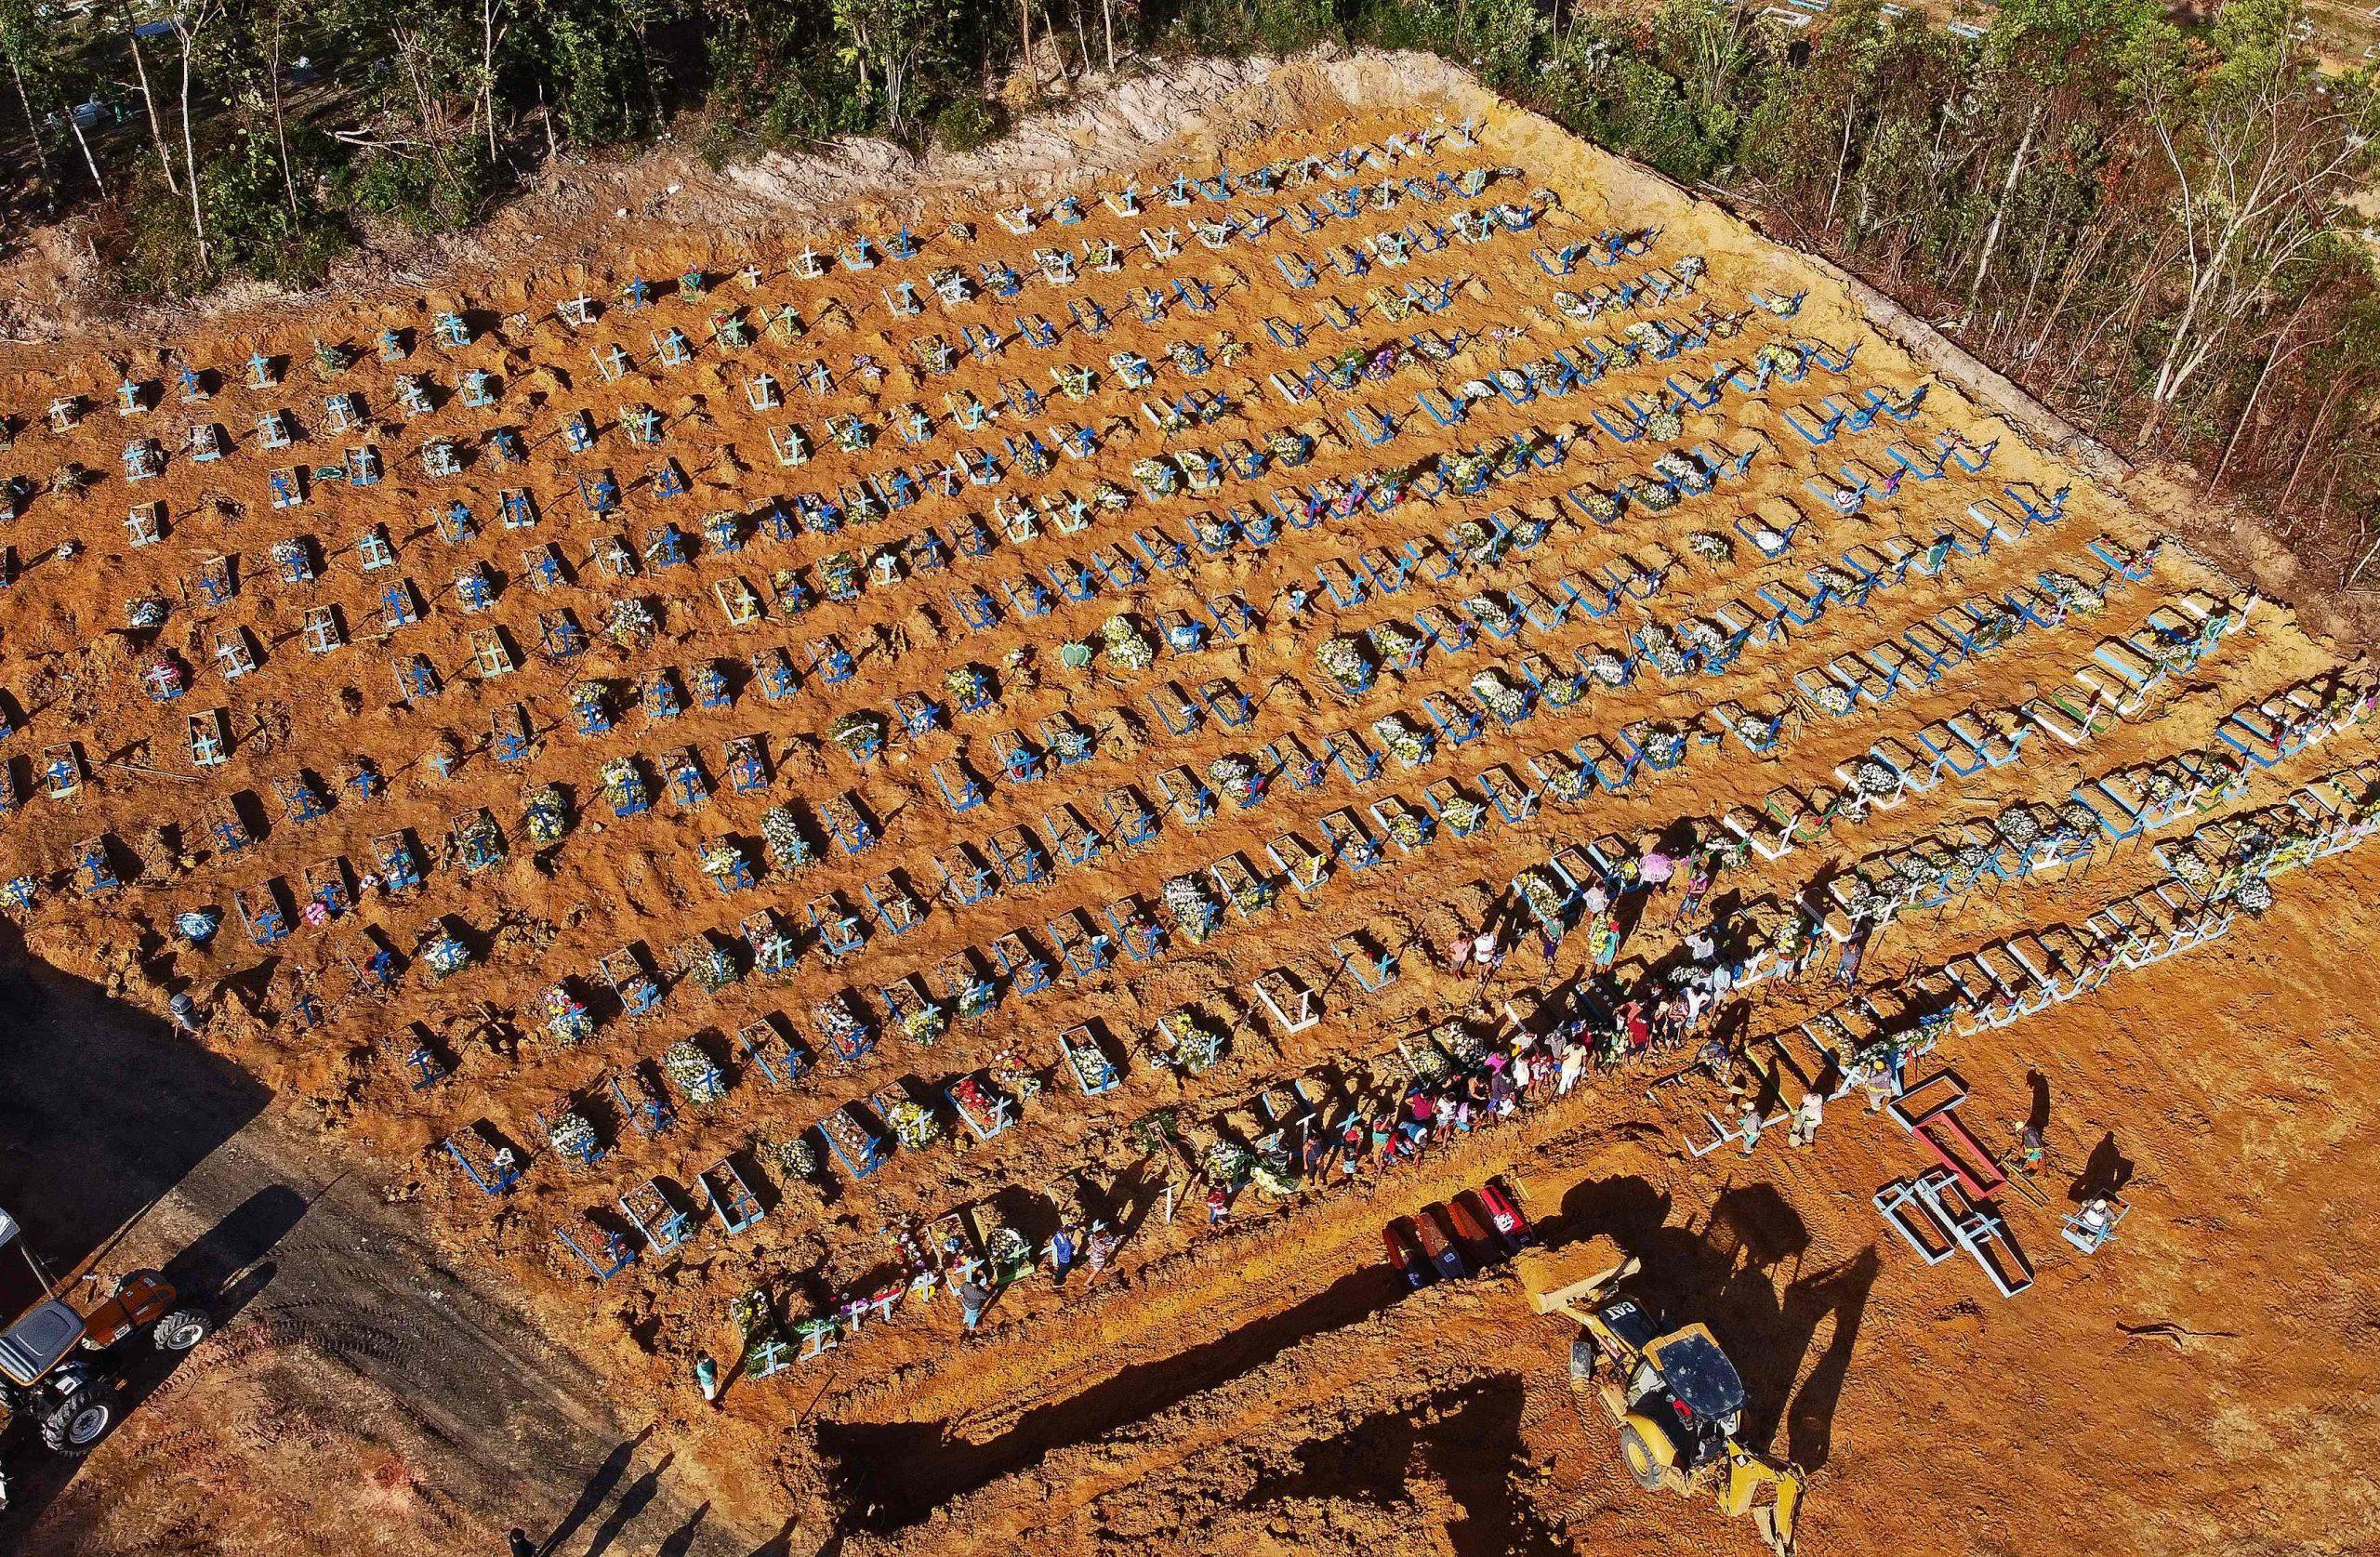 Mass graves Covid-19